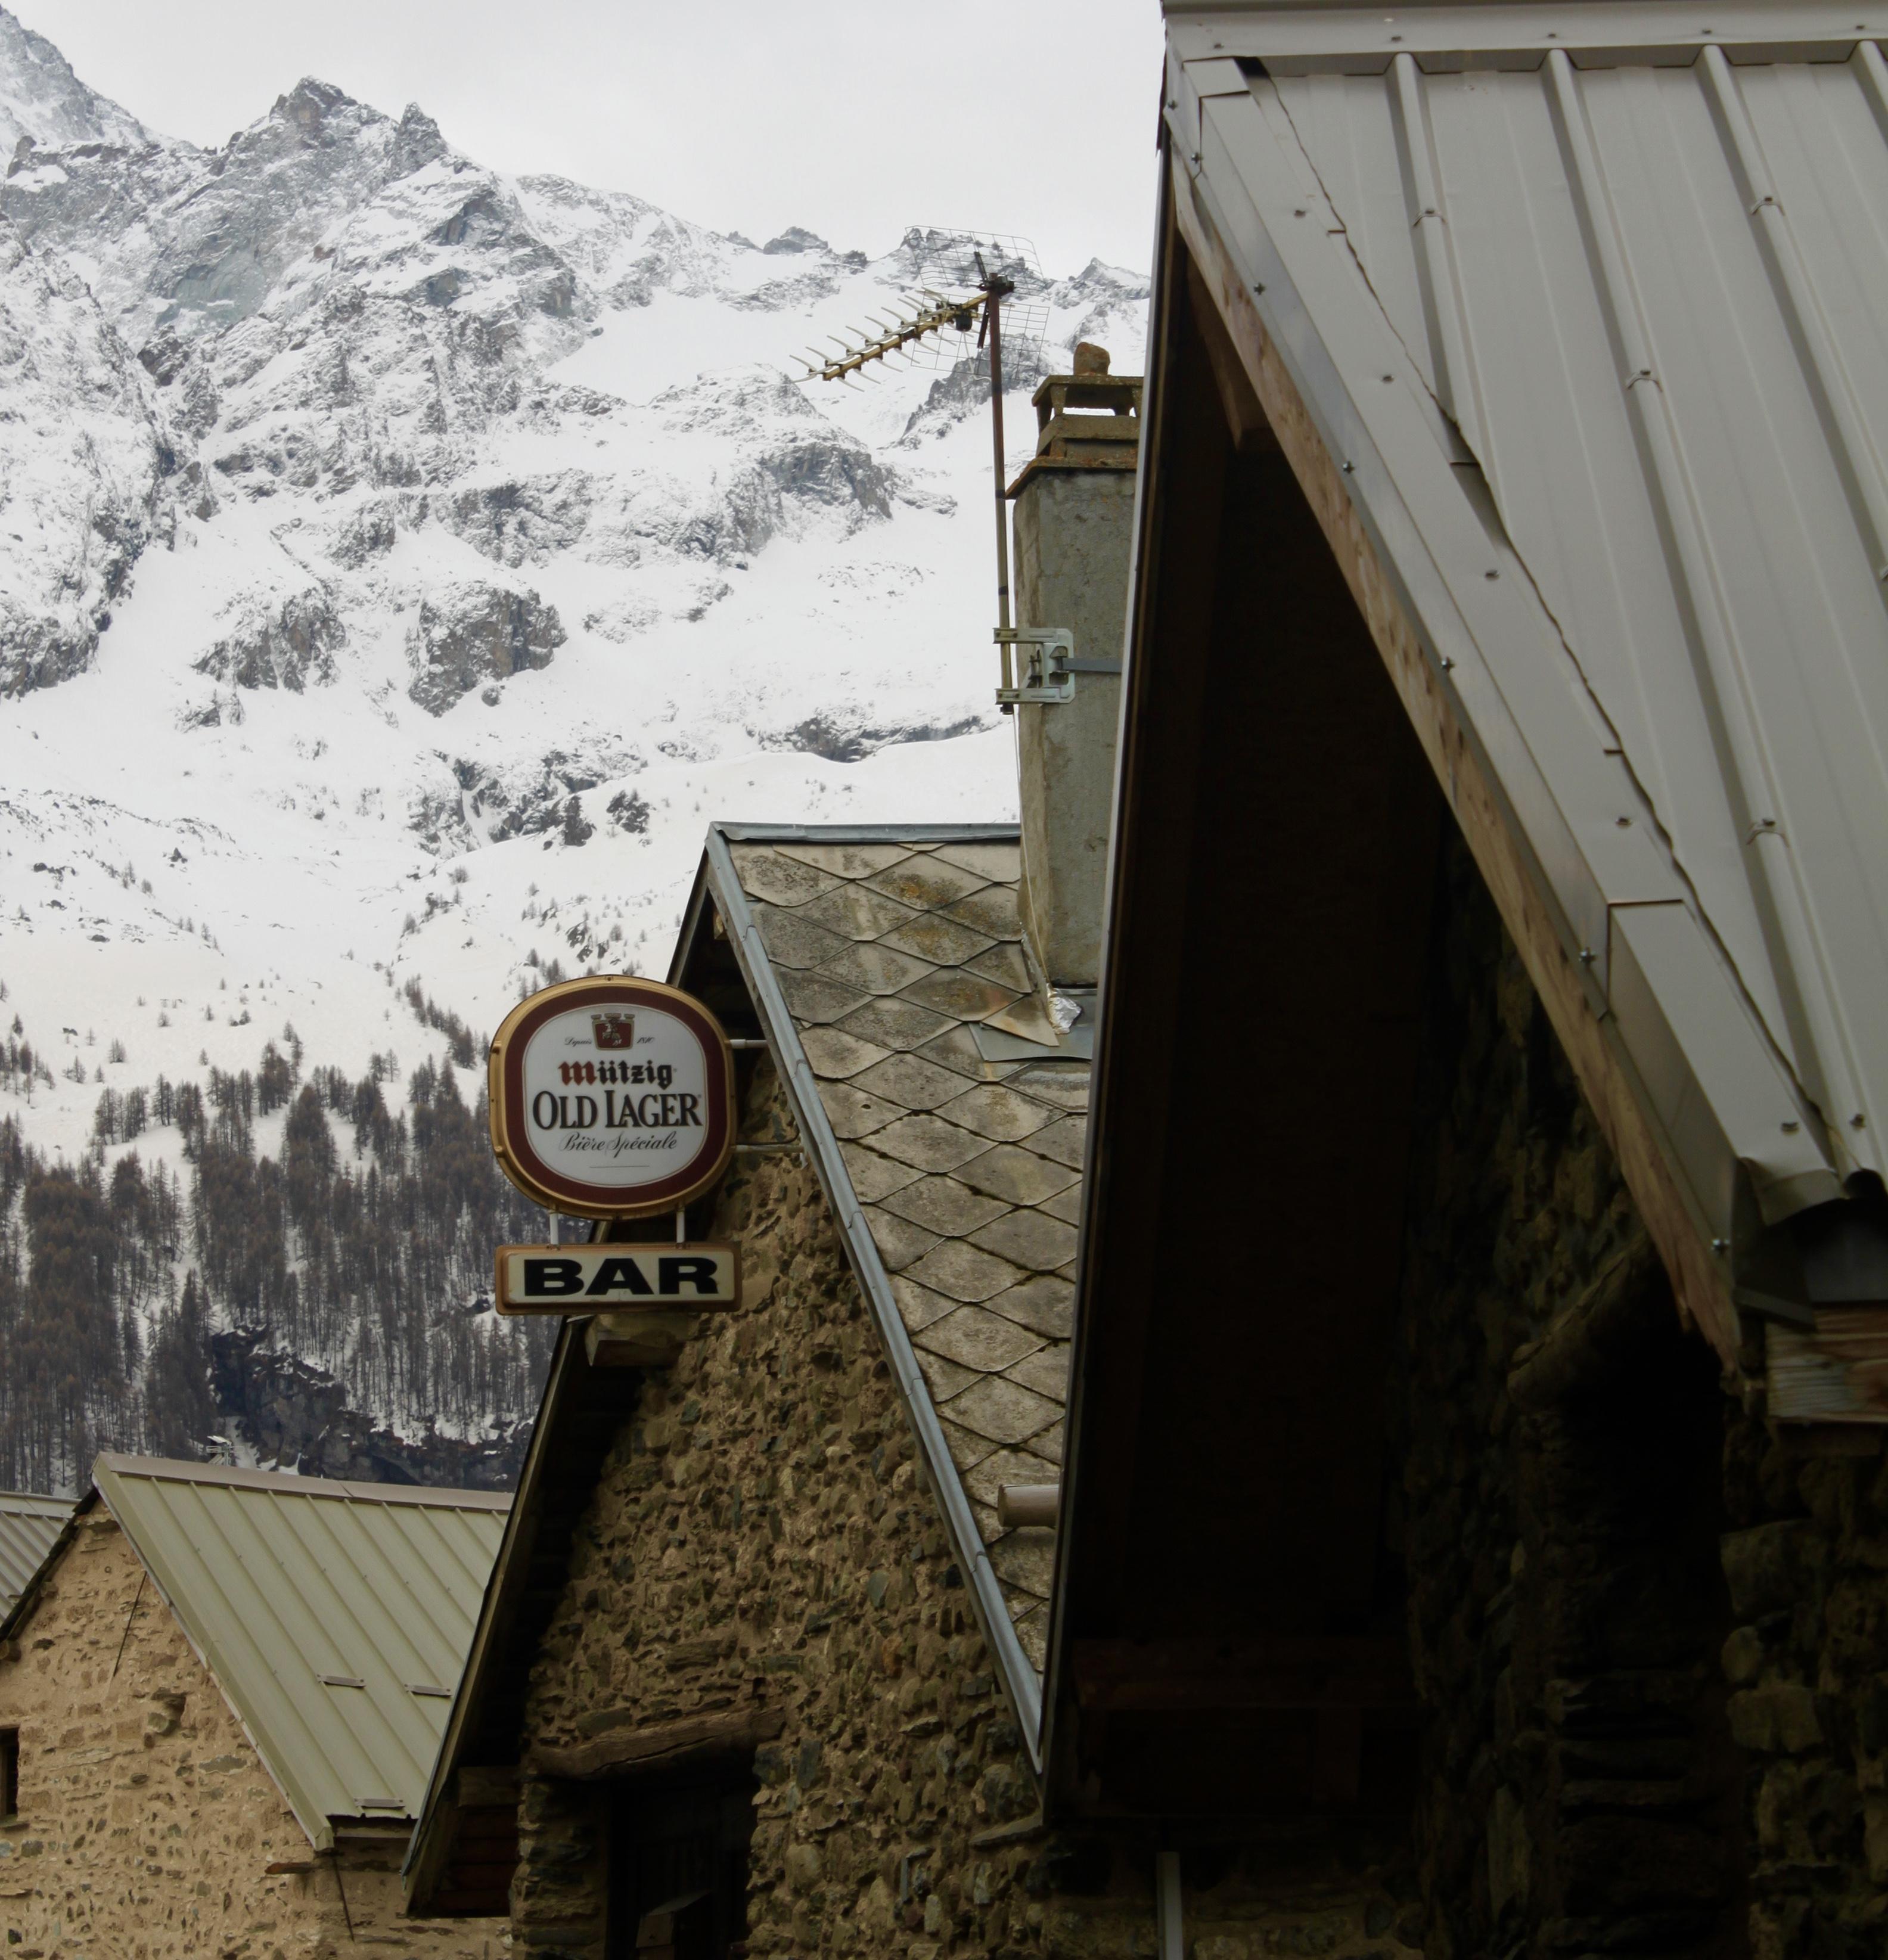 Chazelet Village